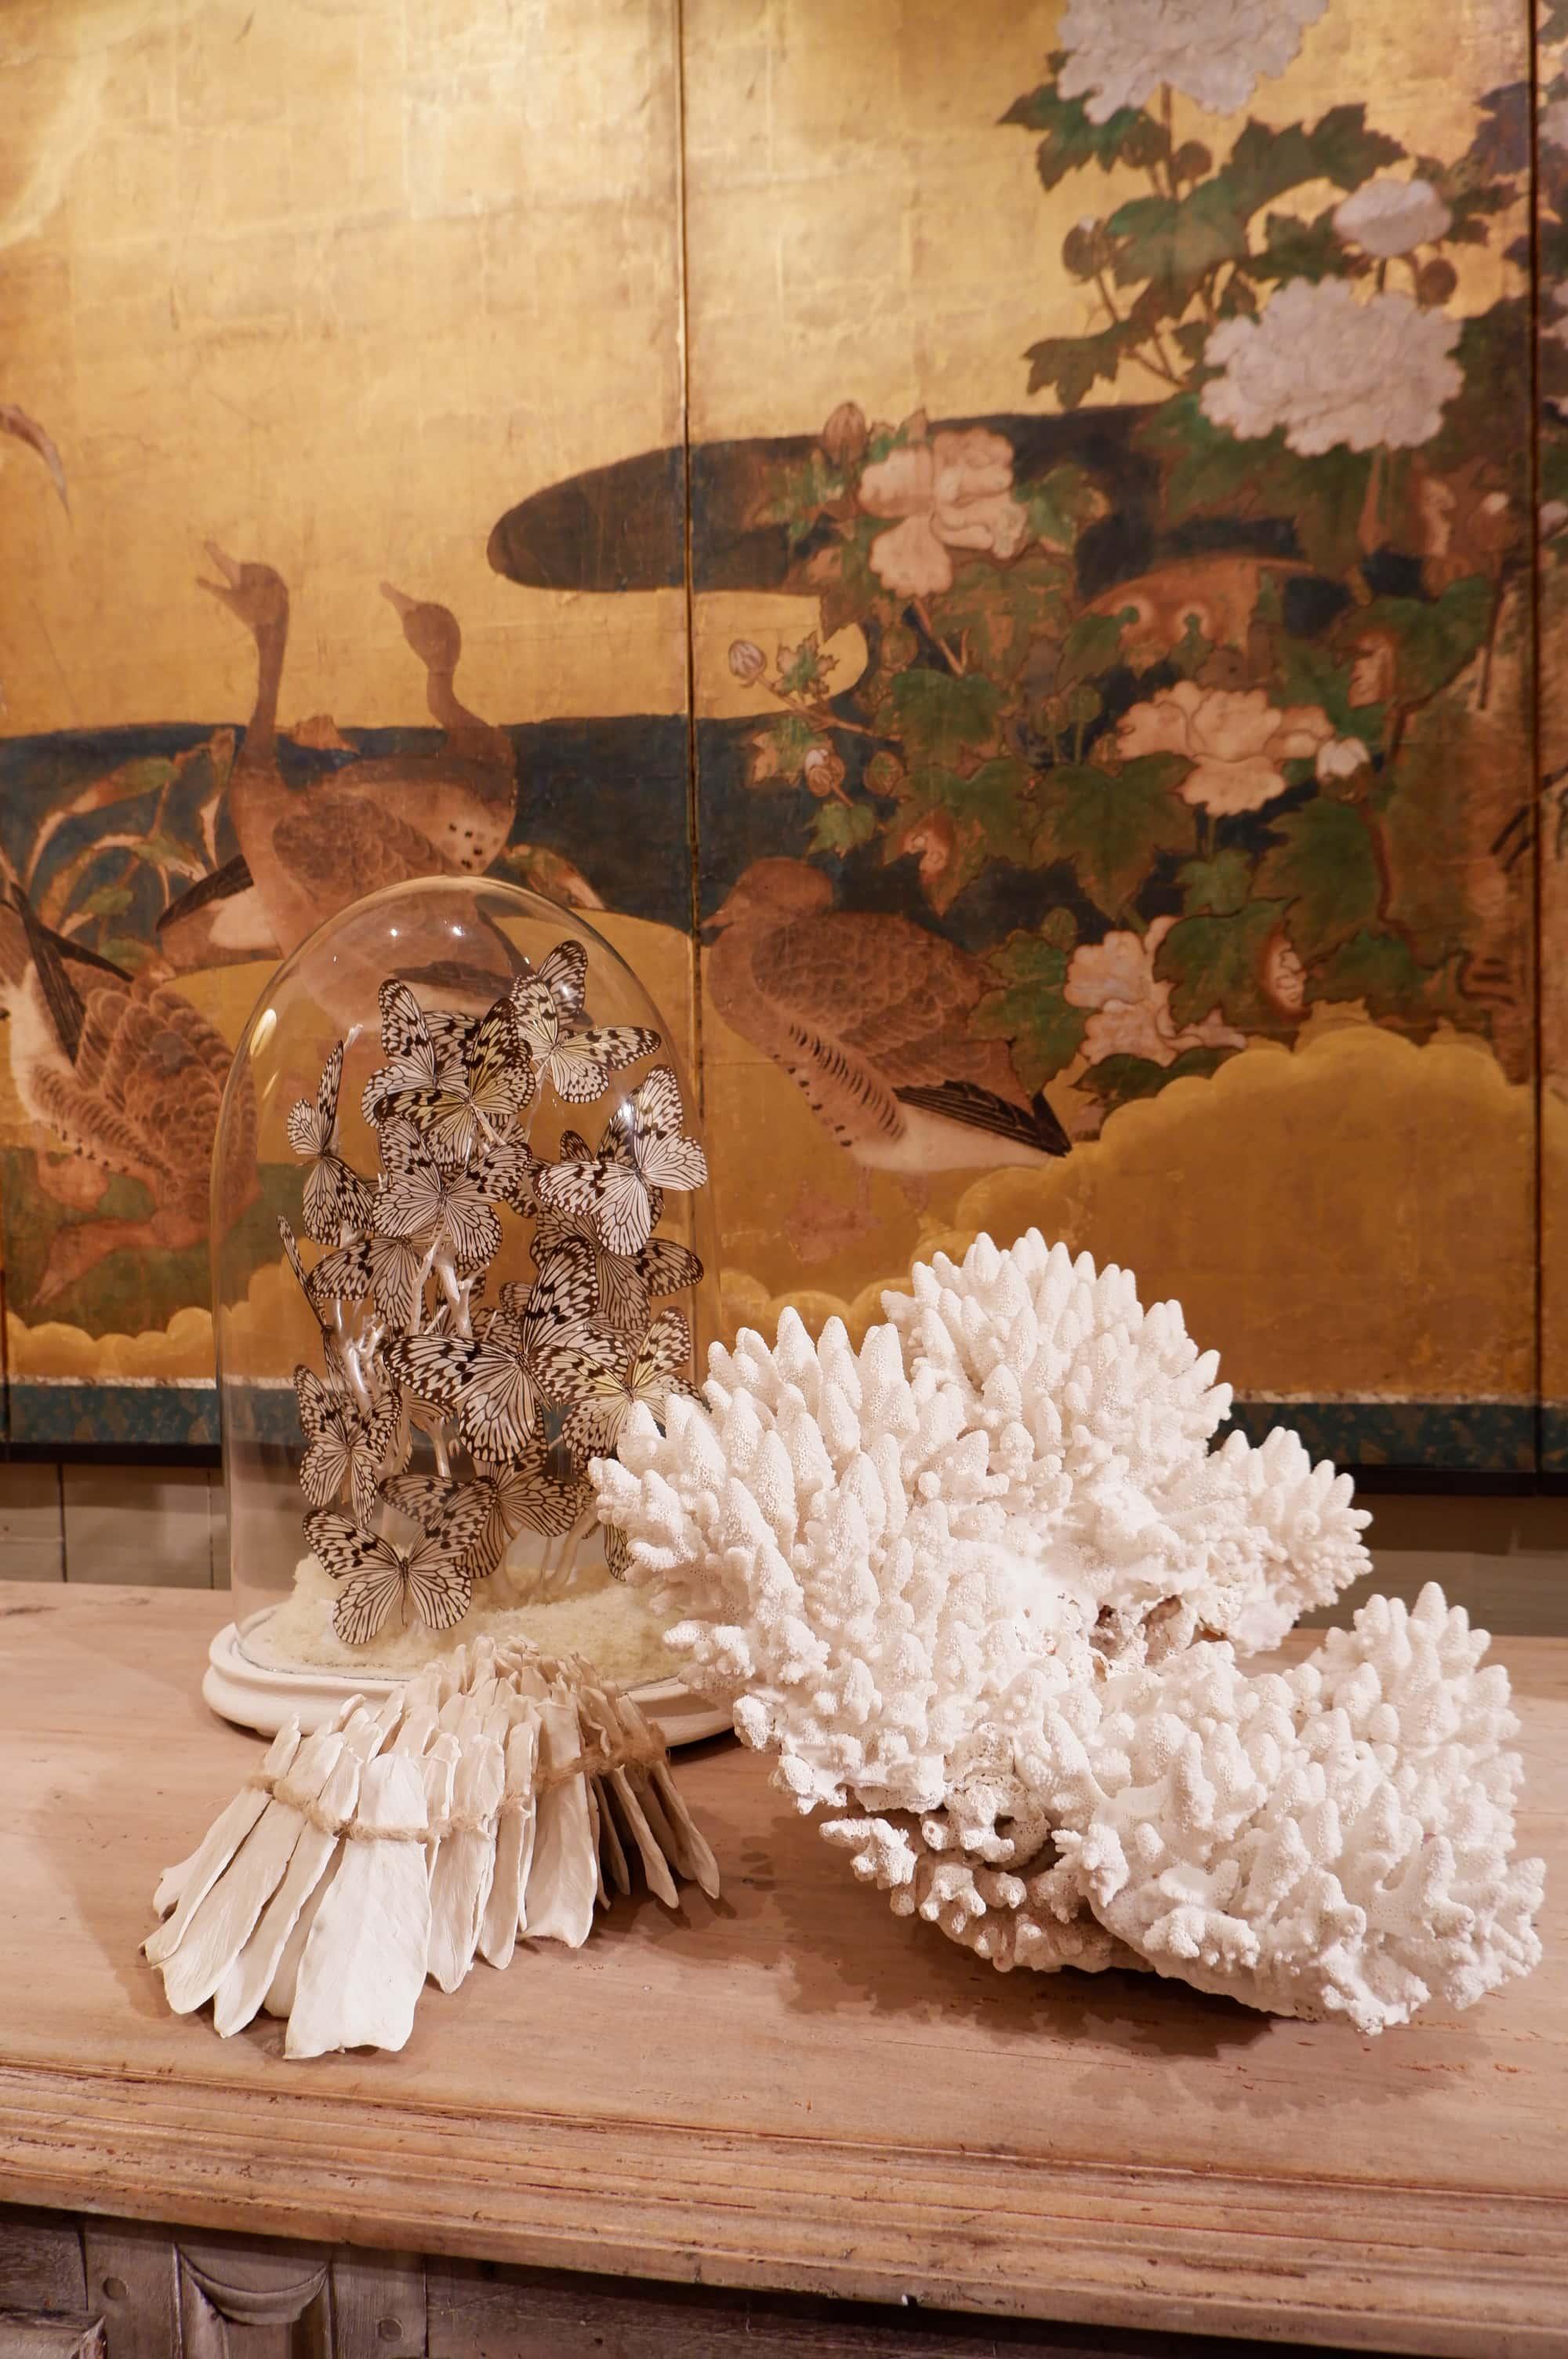 Grande pièce de corail blanc ancien ca.1900